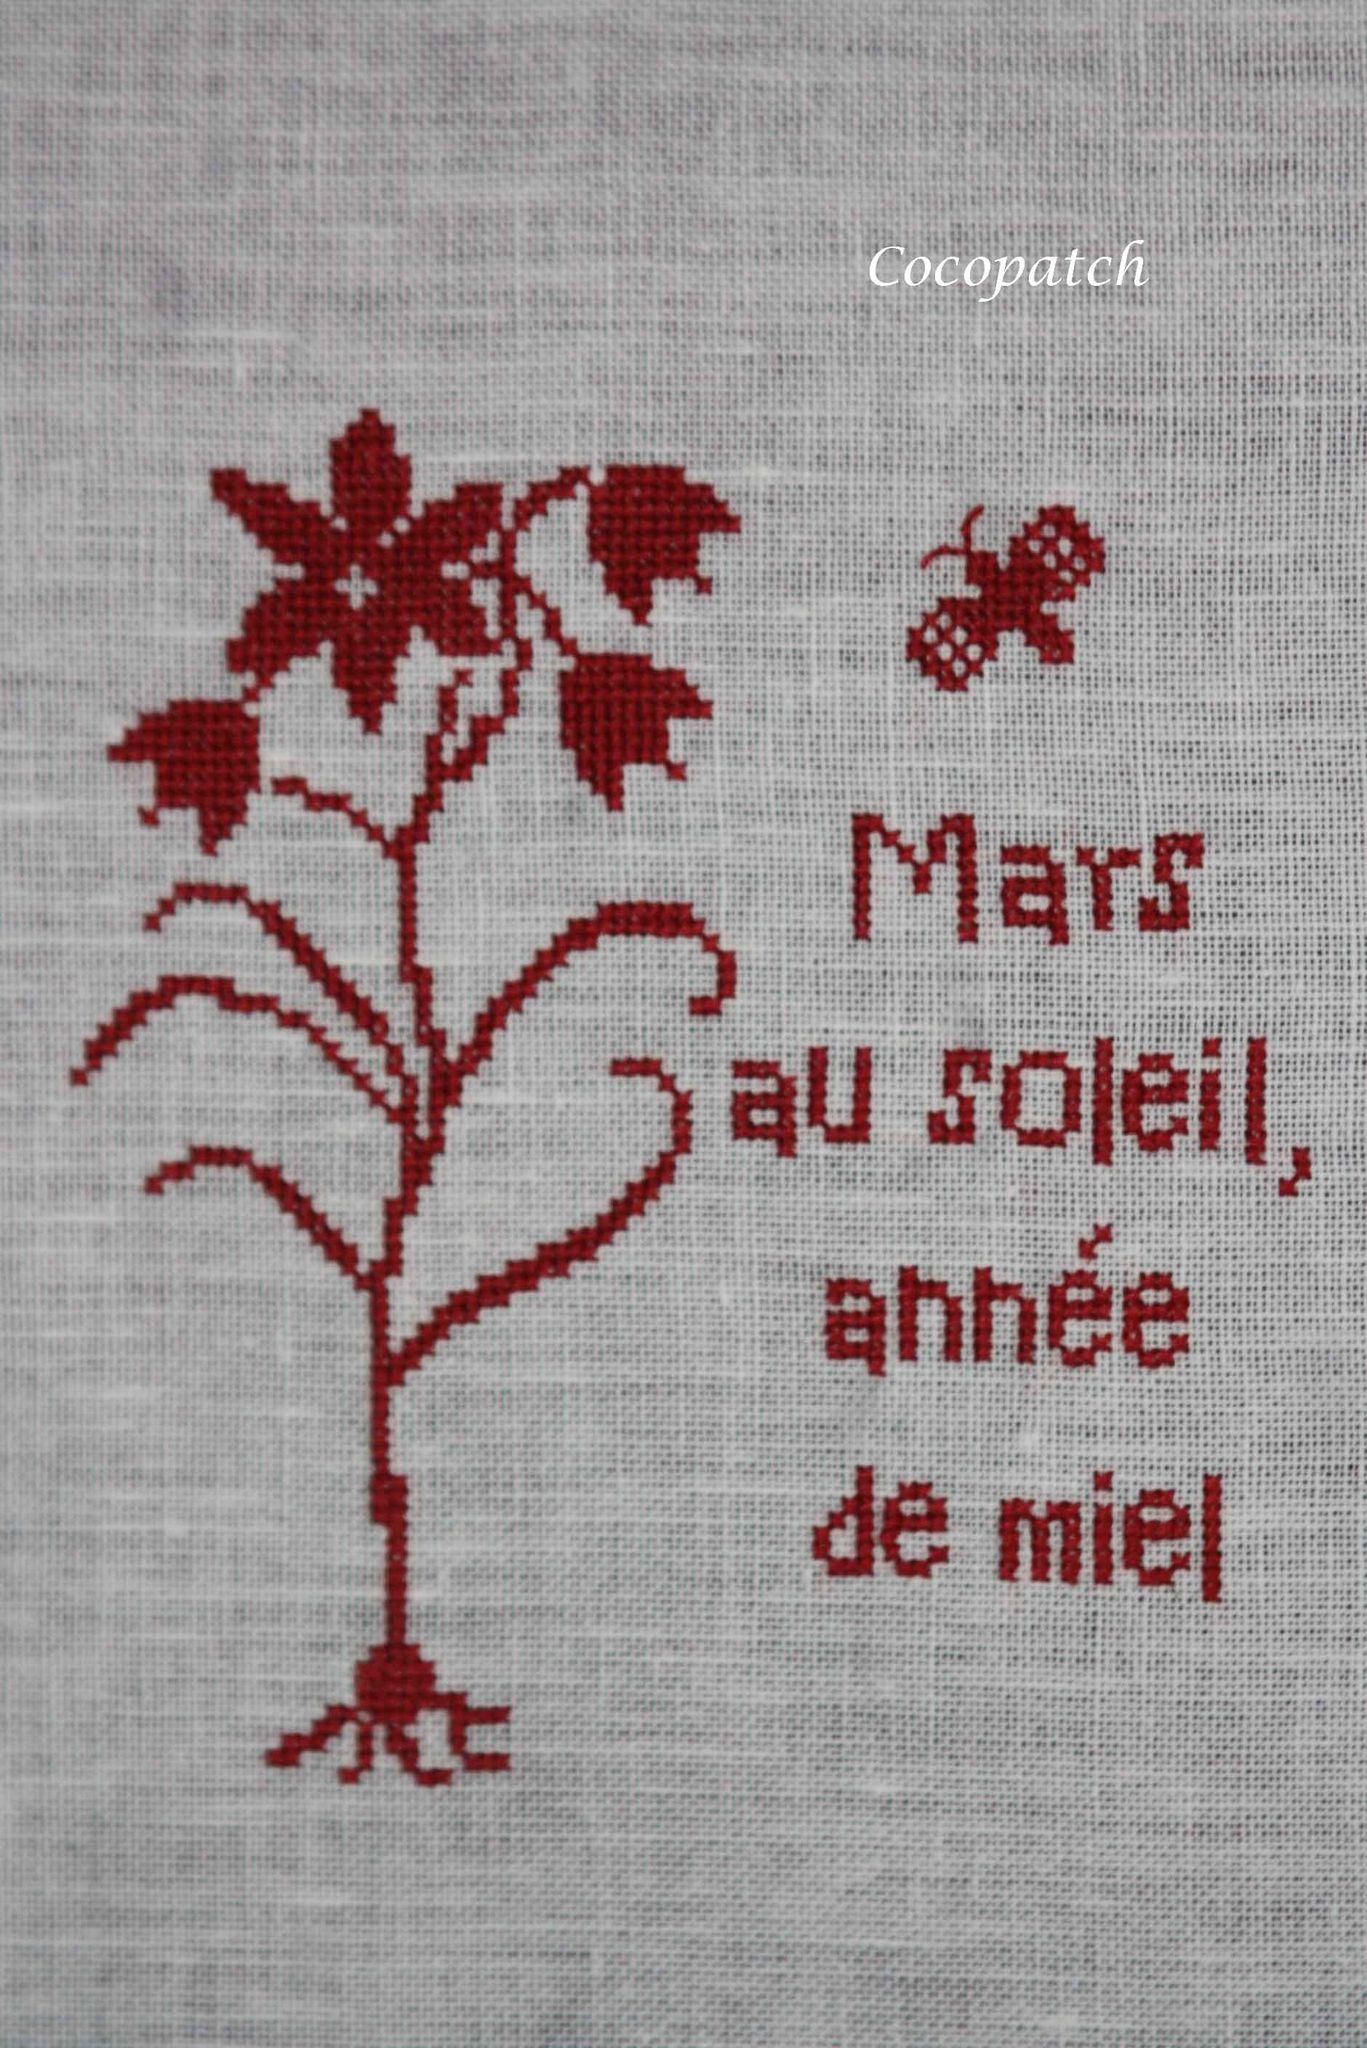 Mars brin